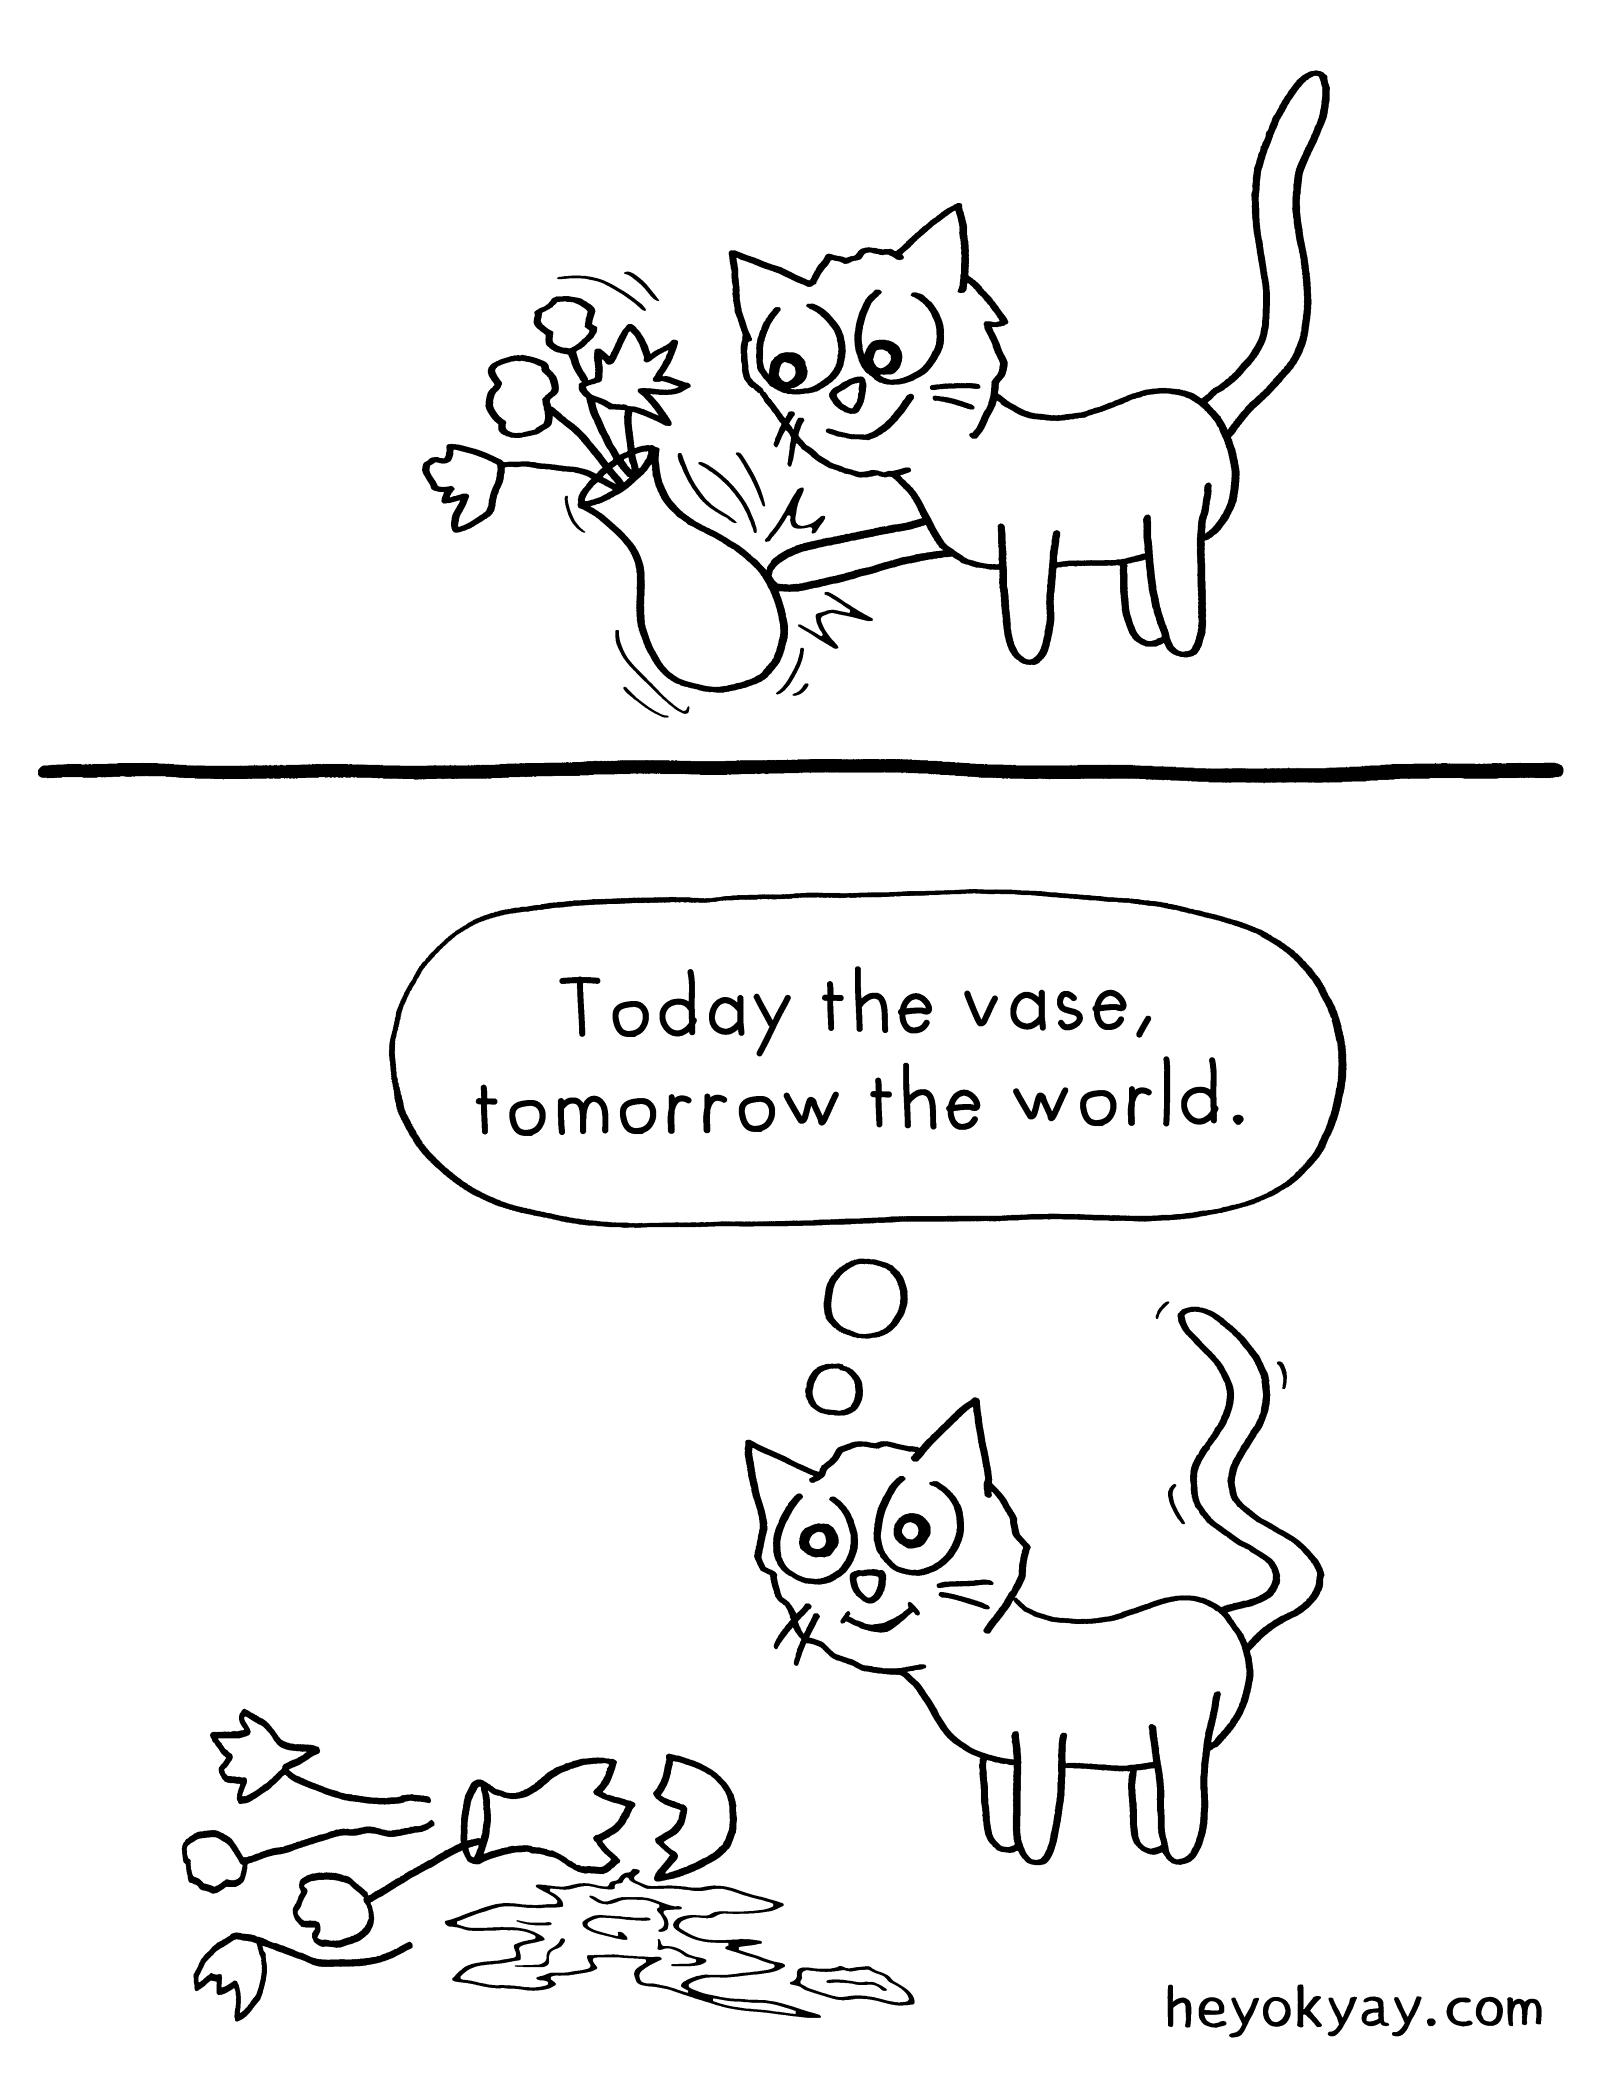 Vase heyokyay comic